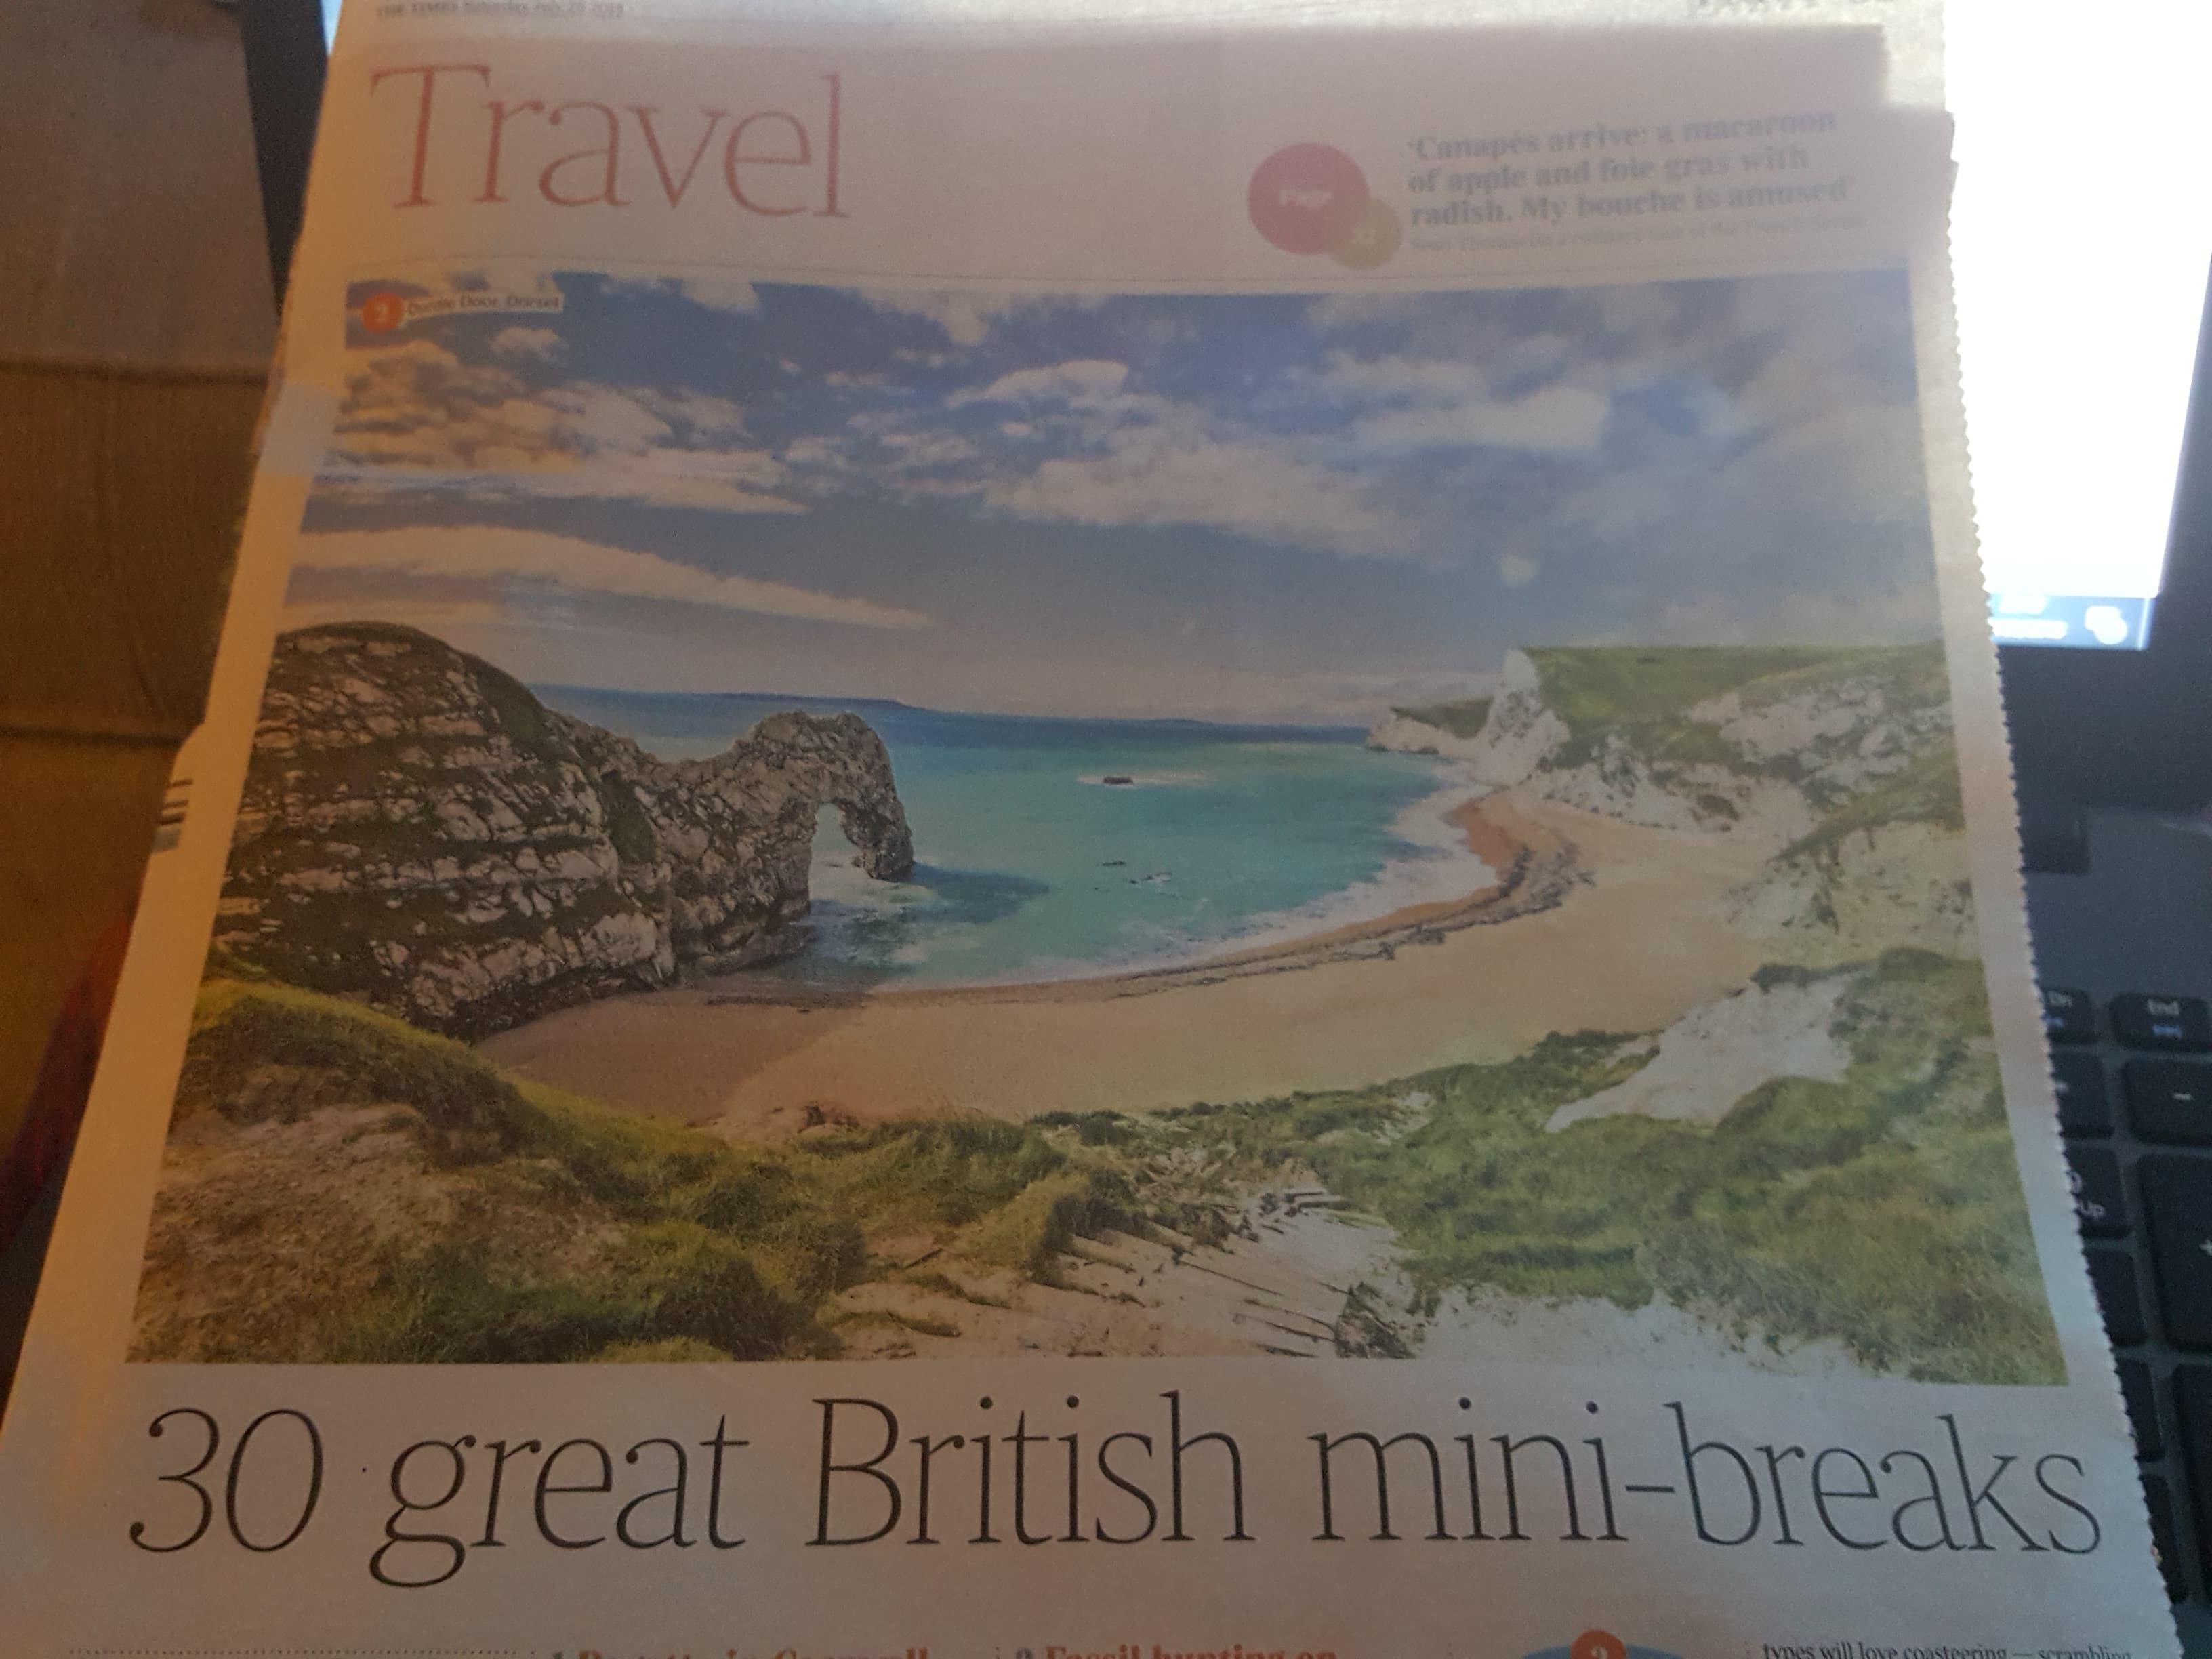 Koru's Frenchman's Creek Kayak Adventure featured in The Times